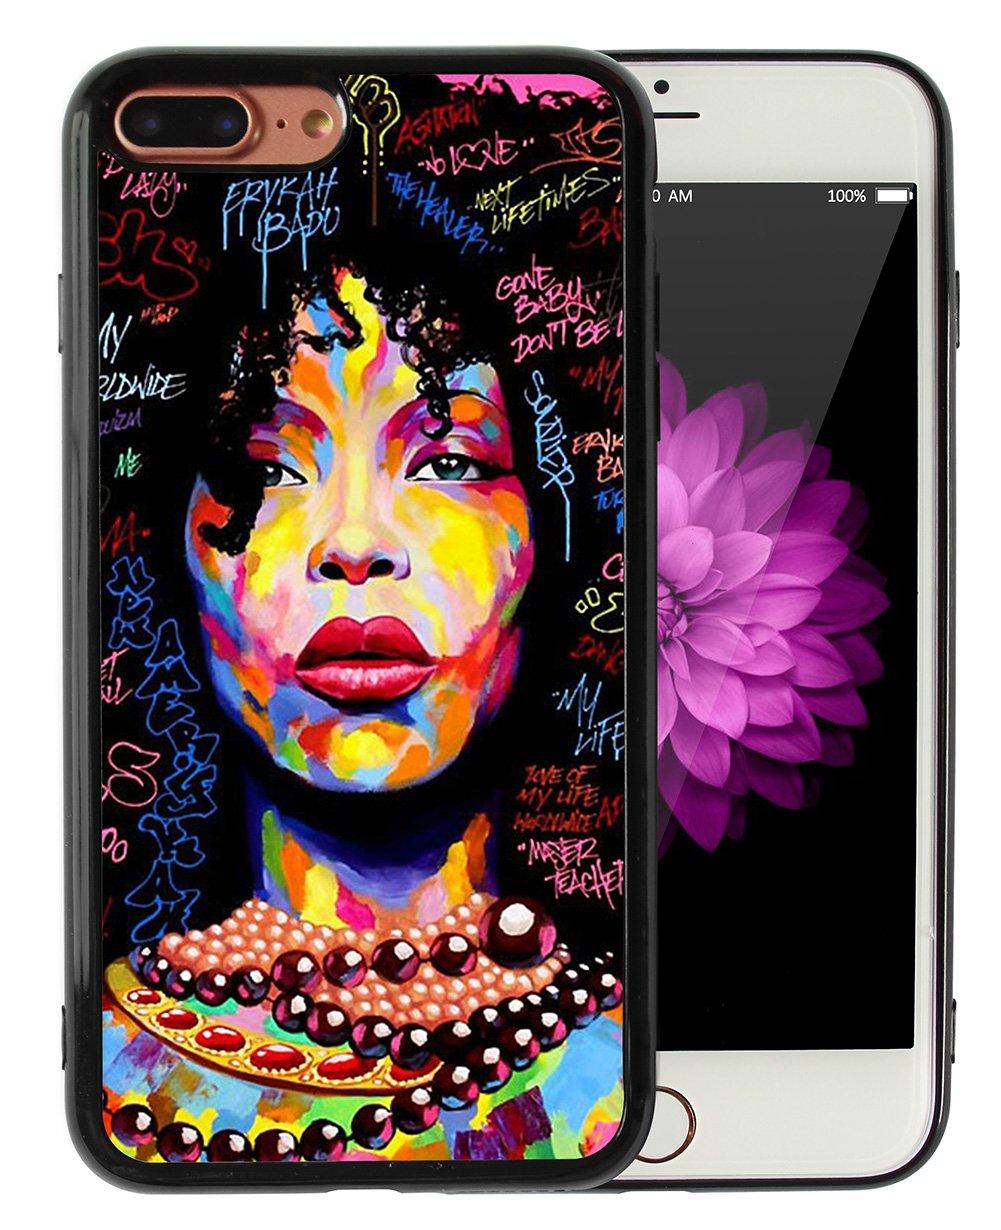 iPhone 7 Plus iPhone 8 Plus Case African American Afro Girls Women Black  Hair Colorful Watercolor Artistic Alphabet Print Design Art Slim Fit in  Tough ... 4645f5a73b